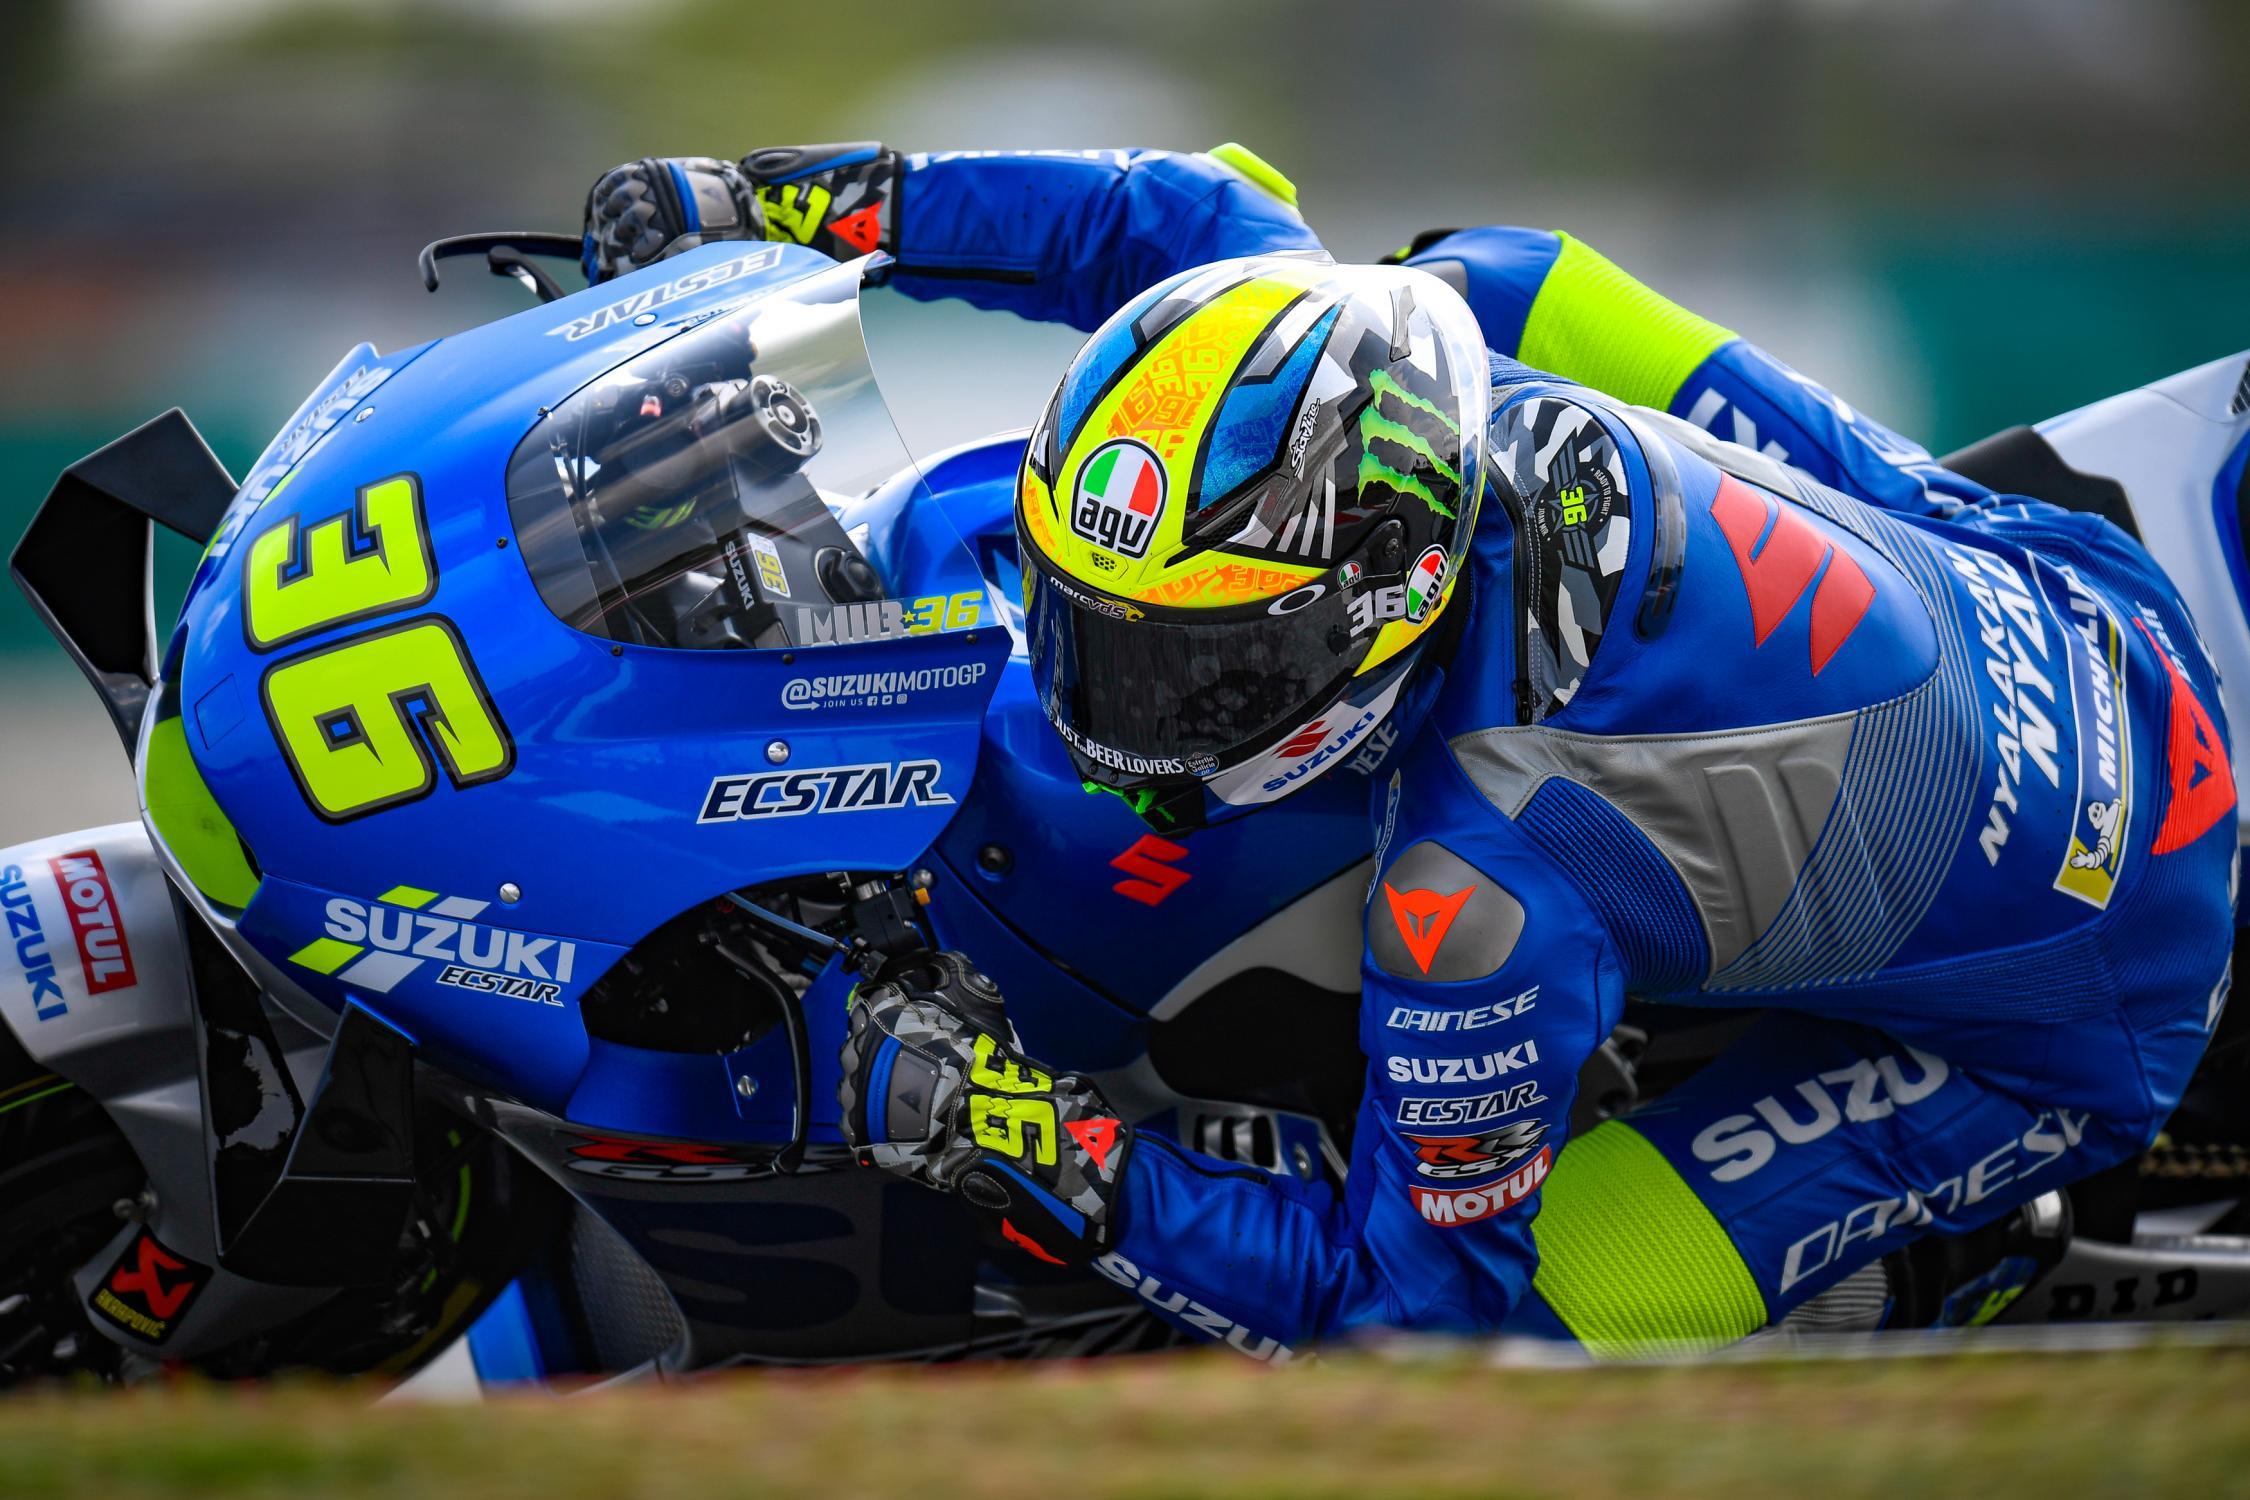 Moto: Mir rinnova, con la Suzuki fino al 2022